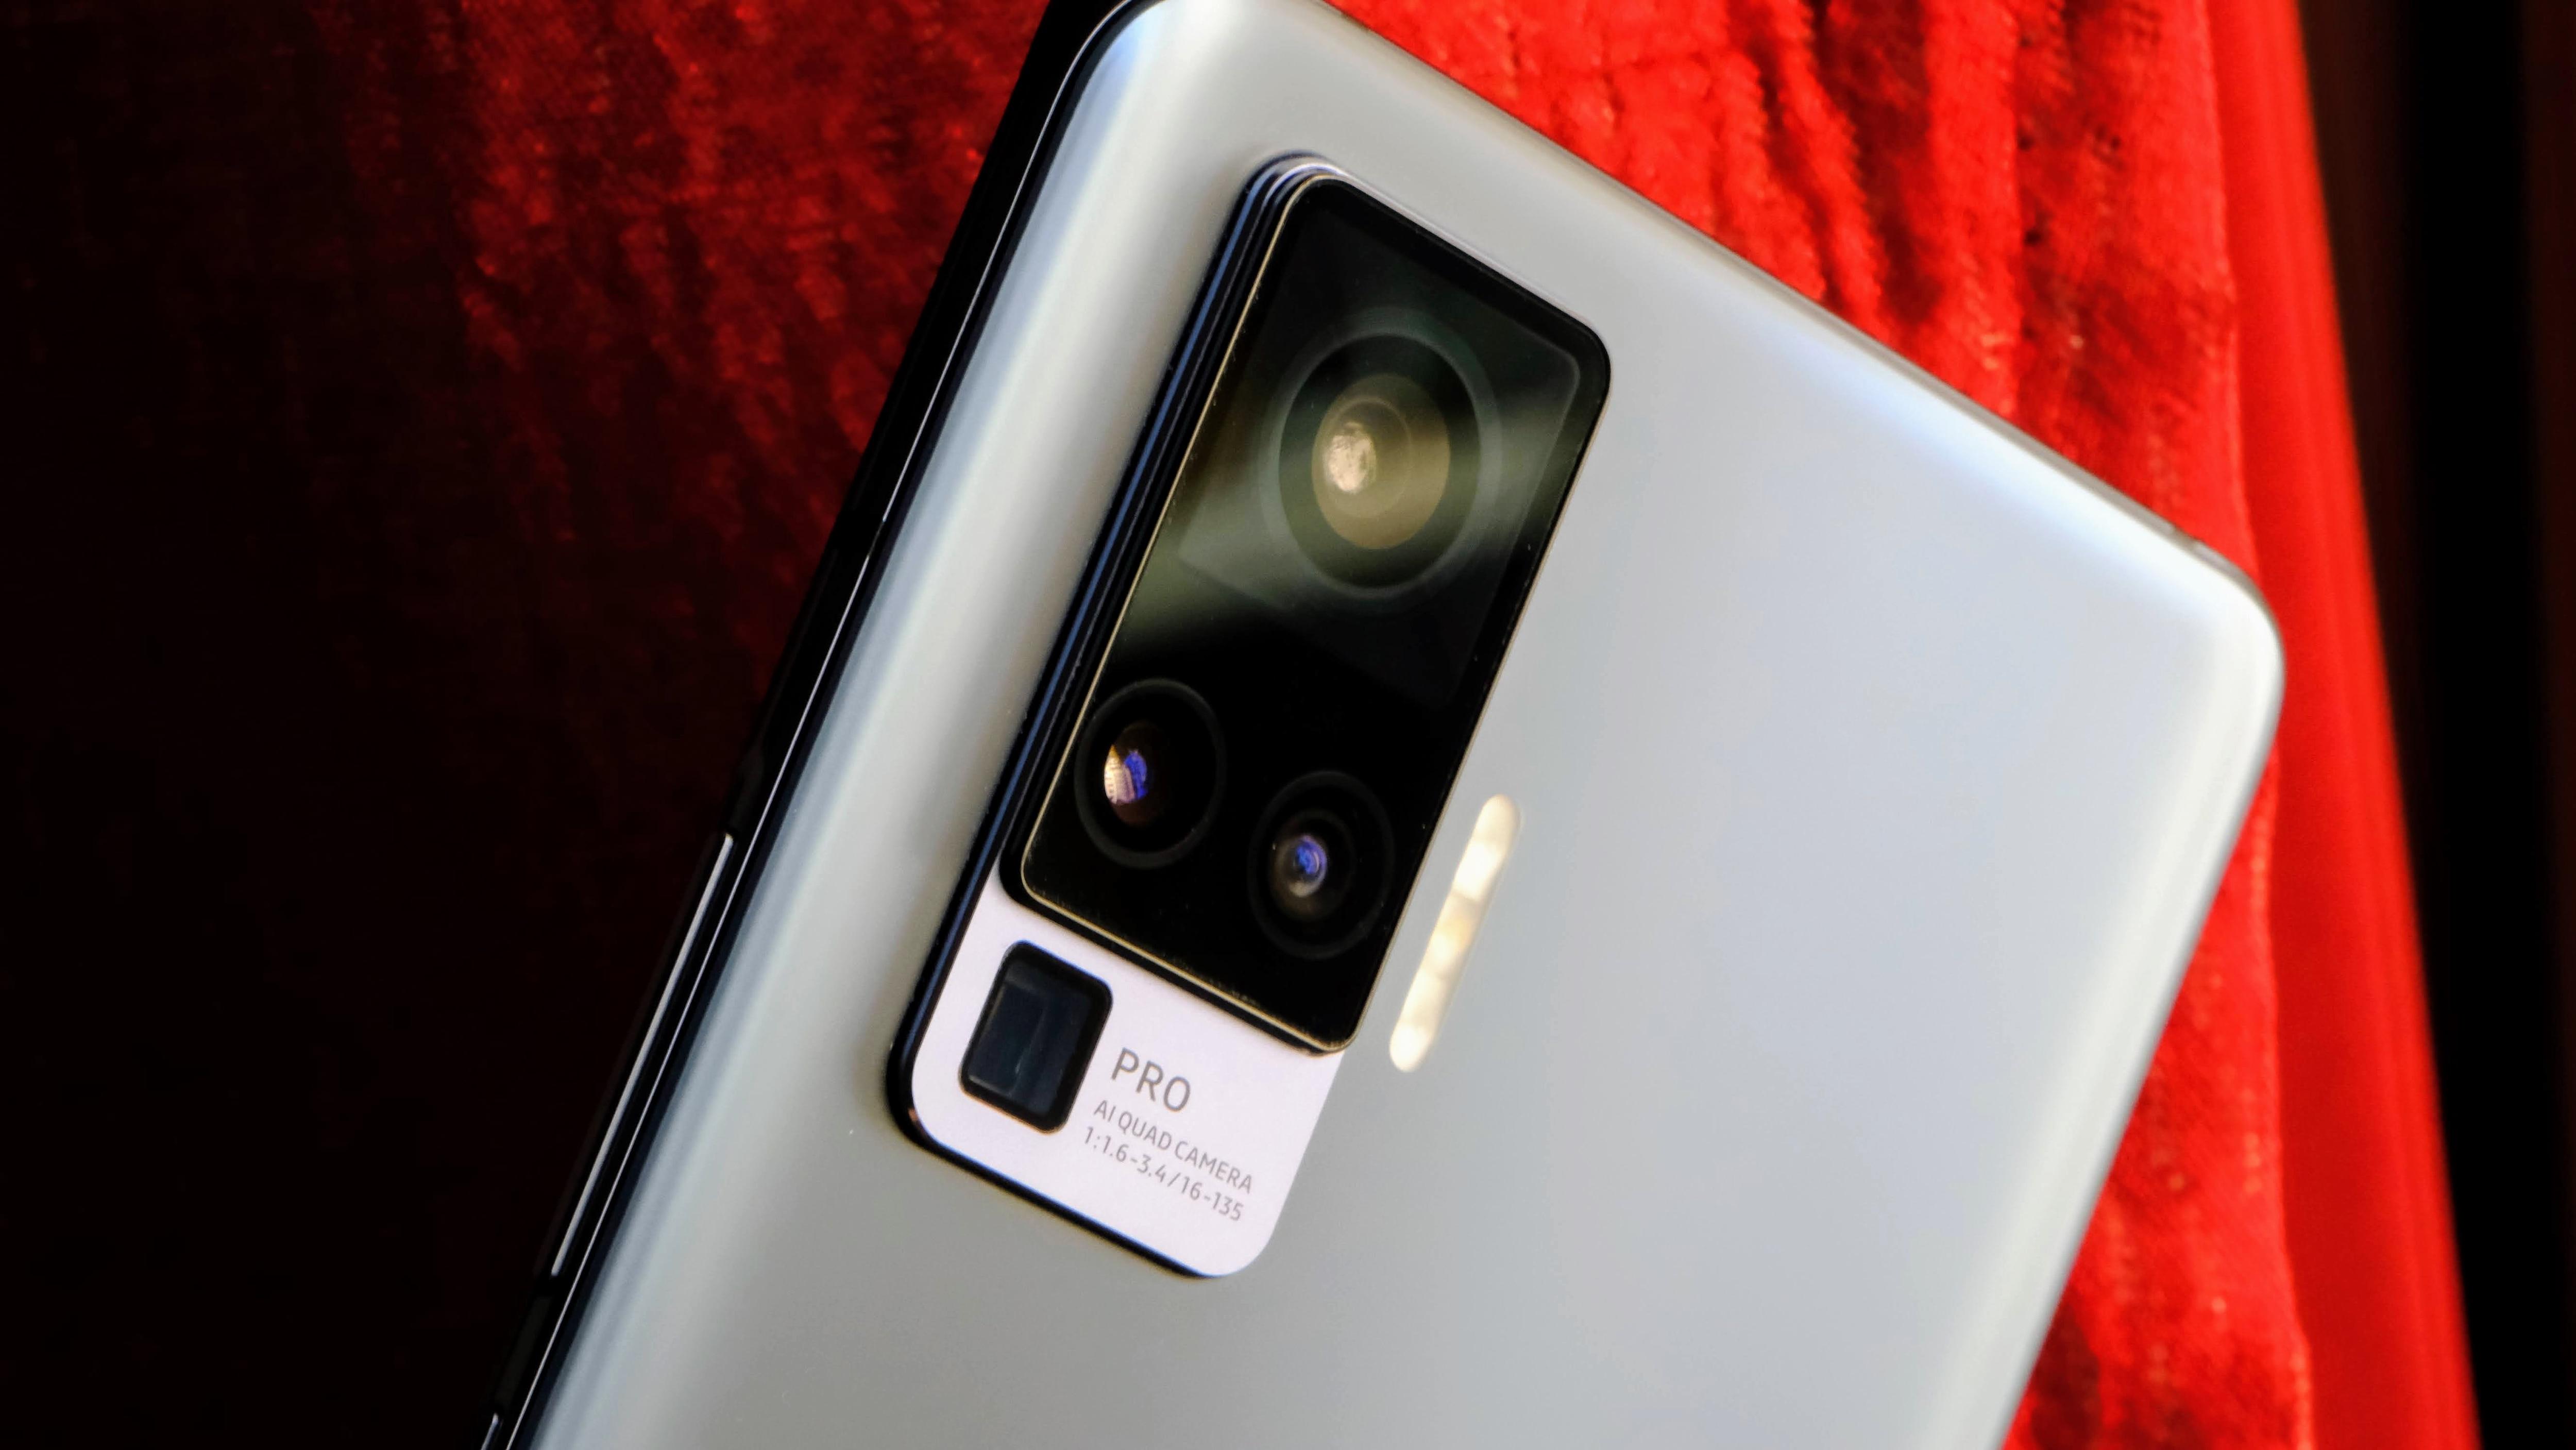 There is a 48-megapixel Gimbal camera at the back with a 12-megapixel portrait lens + 8-megapixel telephoto lens + 8-megapixel Macro lens.